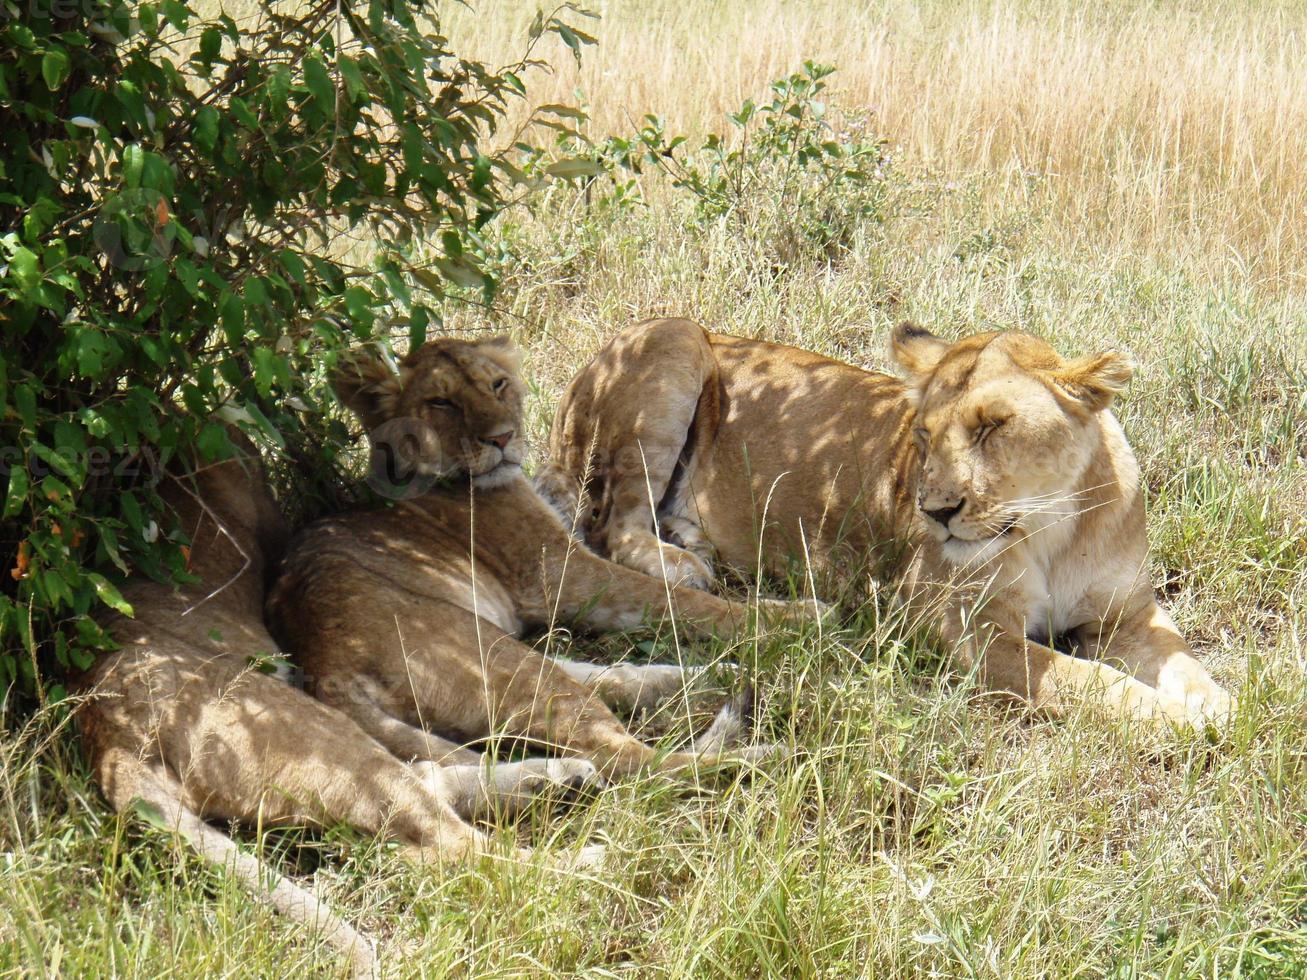 Lions in  golden grass of the Masai Mara Kenya Africa photo